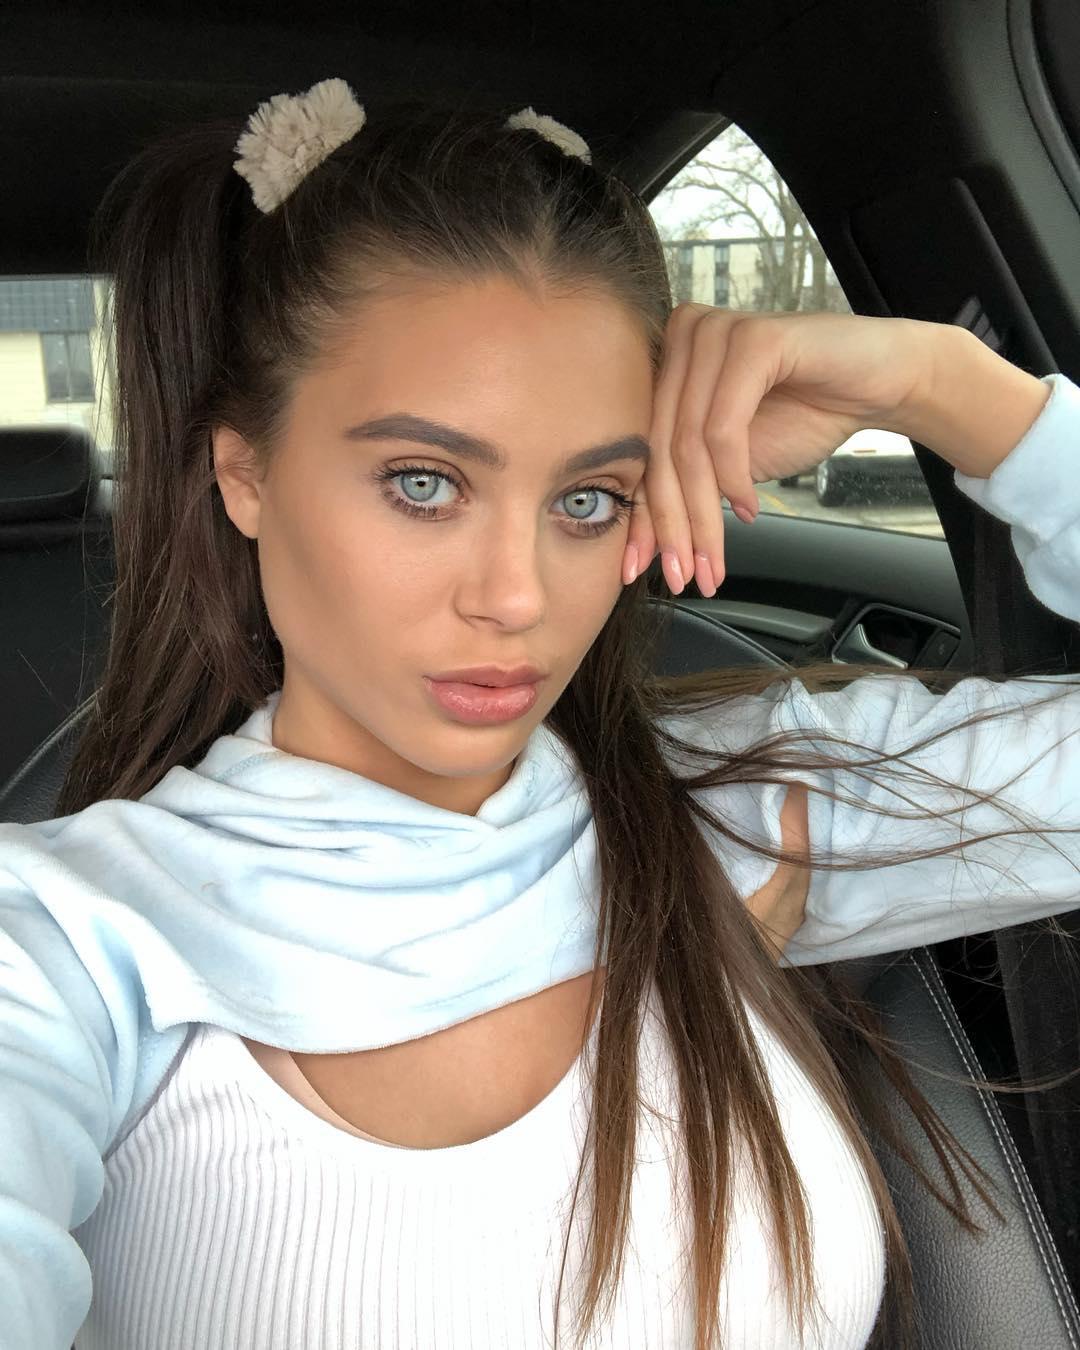 Lana rhoades selfies